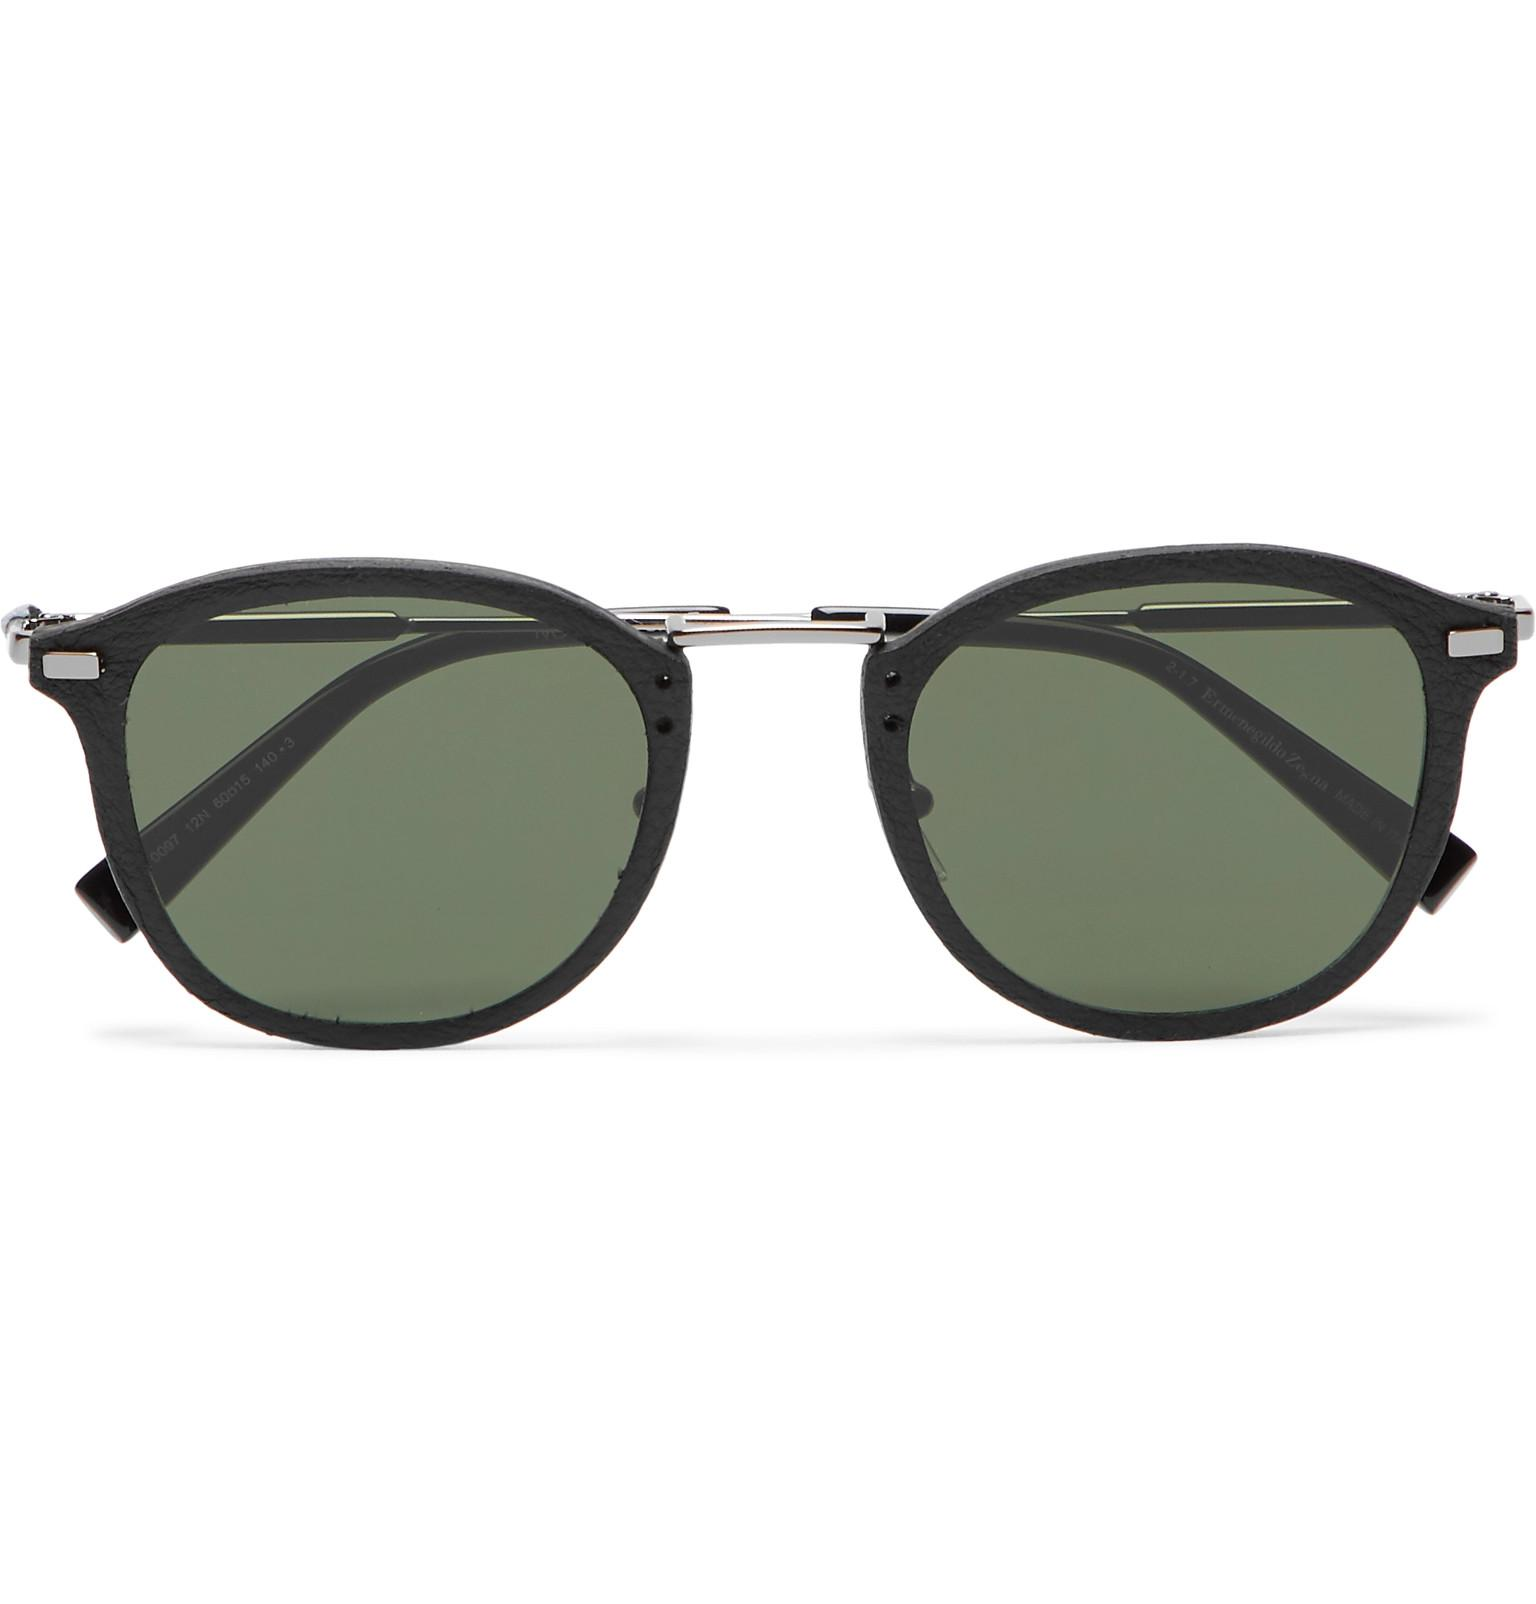 Ermenegildo Zegna Round-frame Leather-trimmed Acetate And Gunmetal-tone Sunglasses - Black hd1CN0